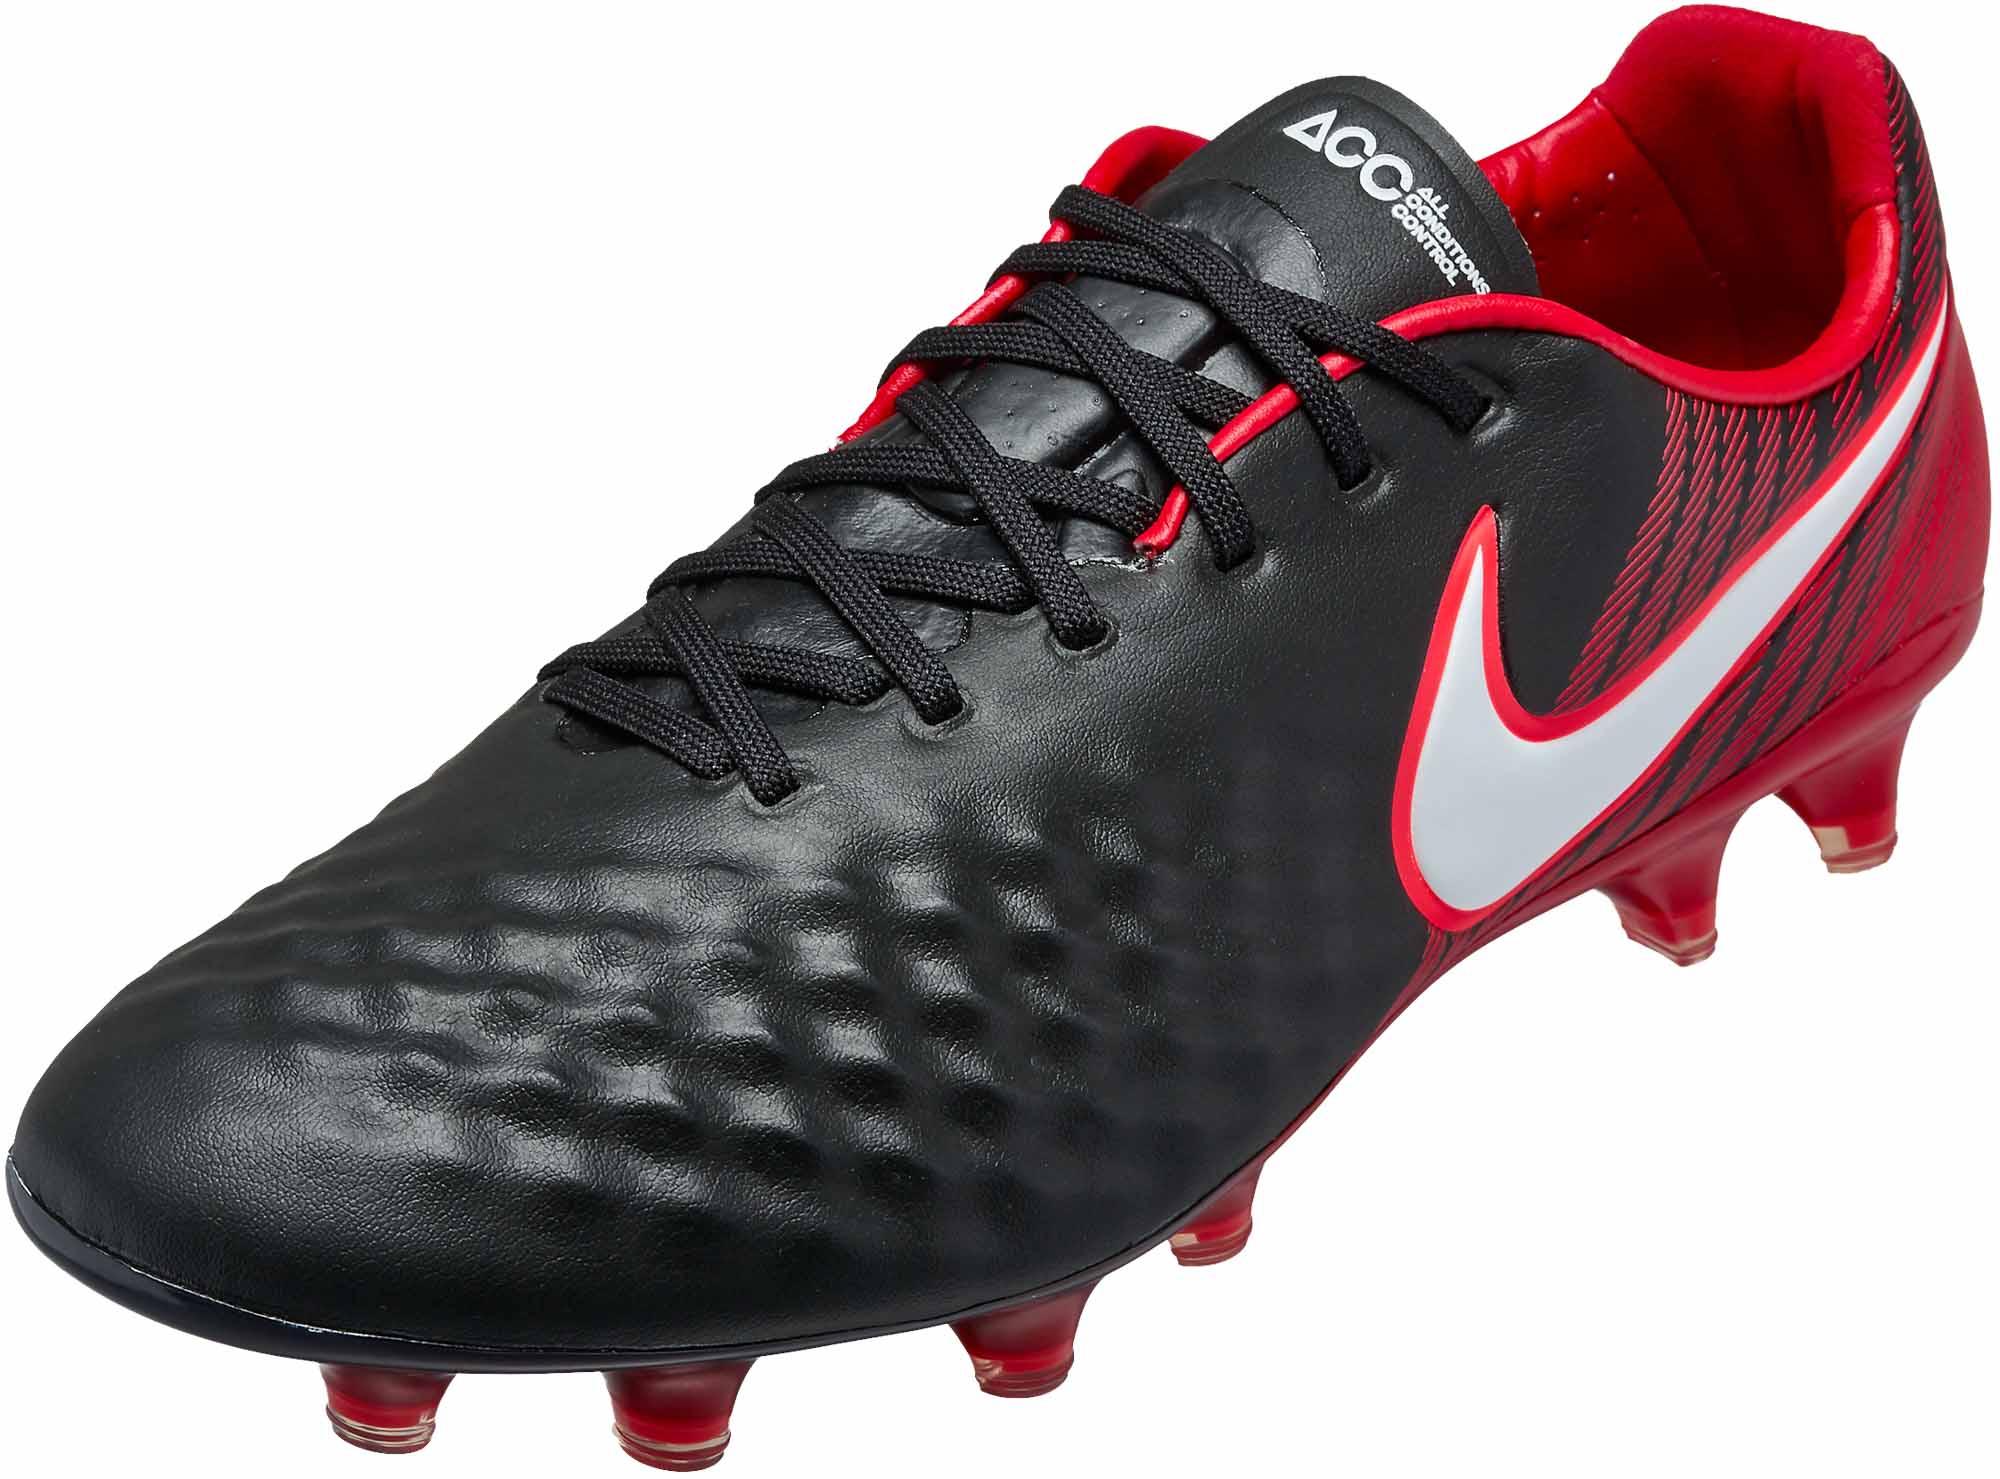 Nike Magista Opus II FG - Black & White